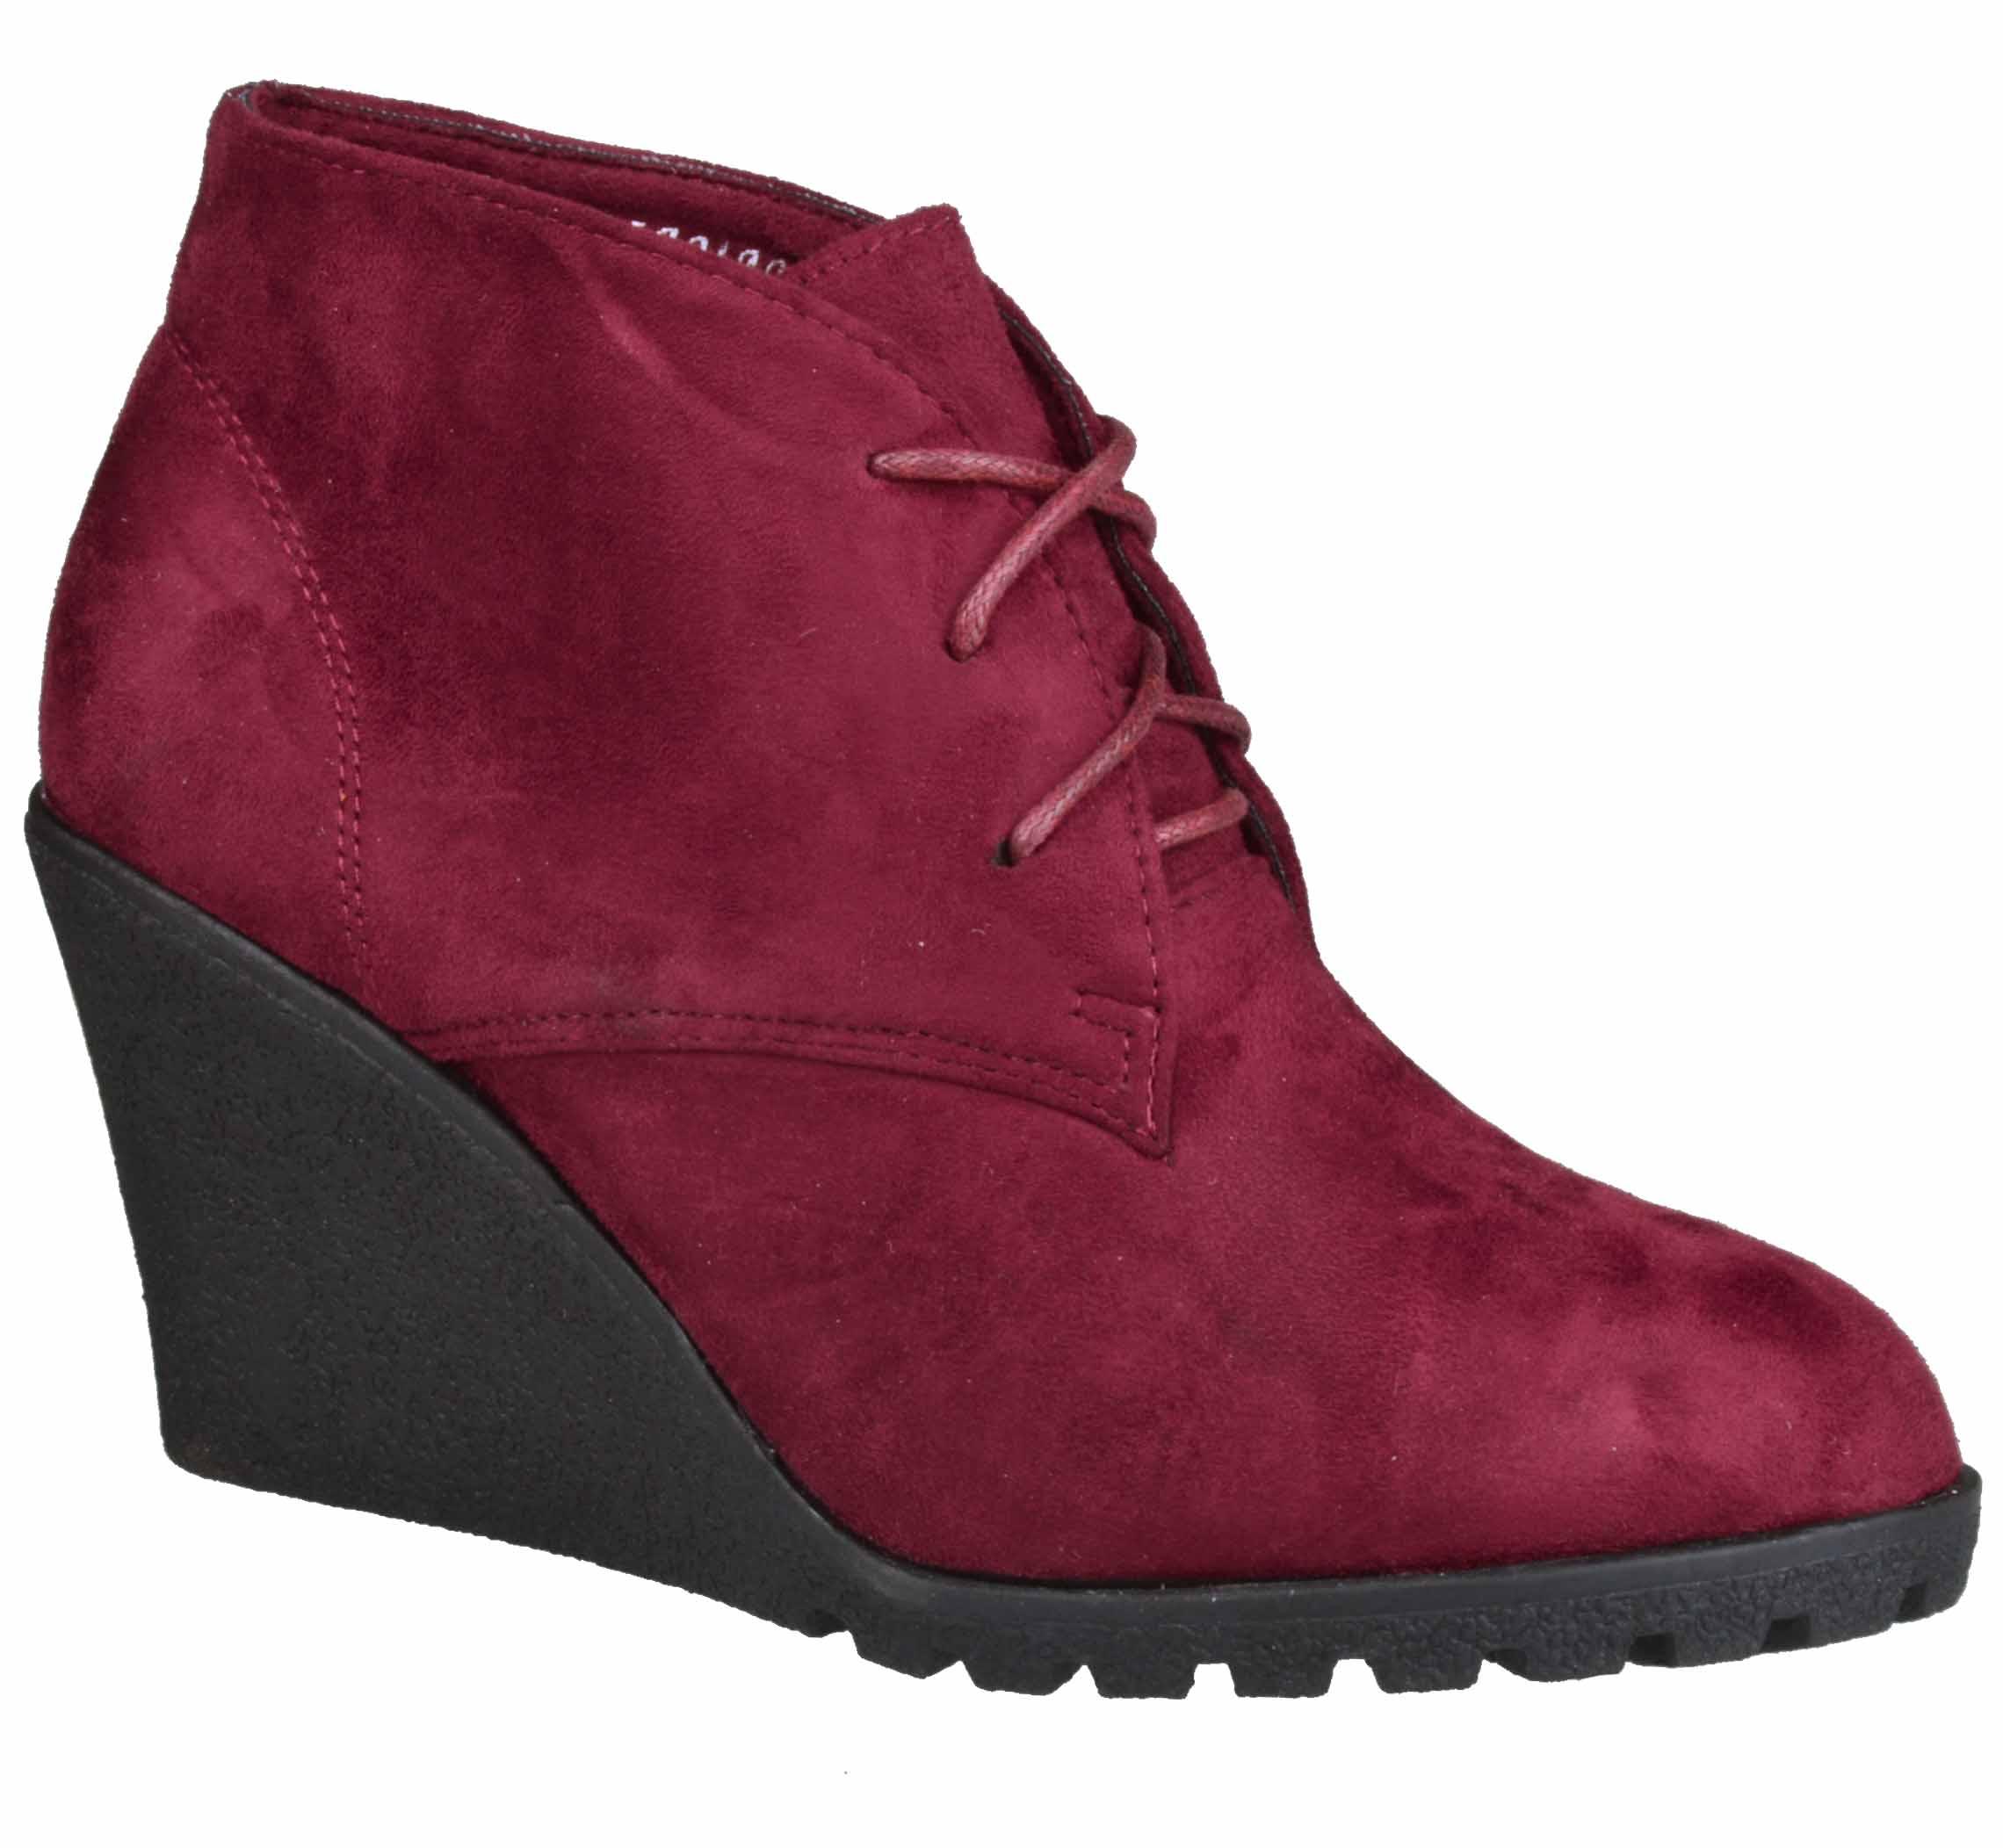 32a1b6ca00 Γυναικείες Μπότες   Μποτάκια (Ταξινόμηση  Φθηνότερα)